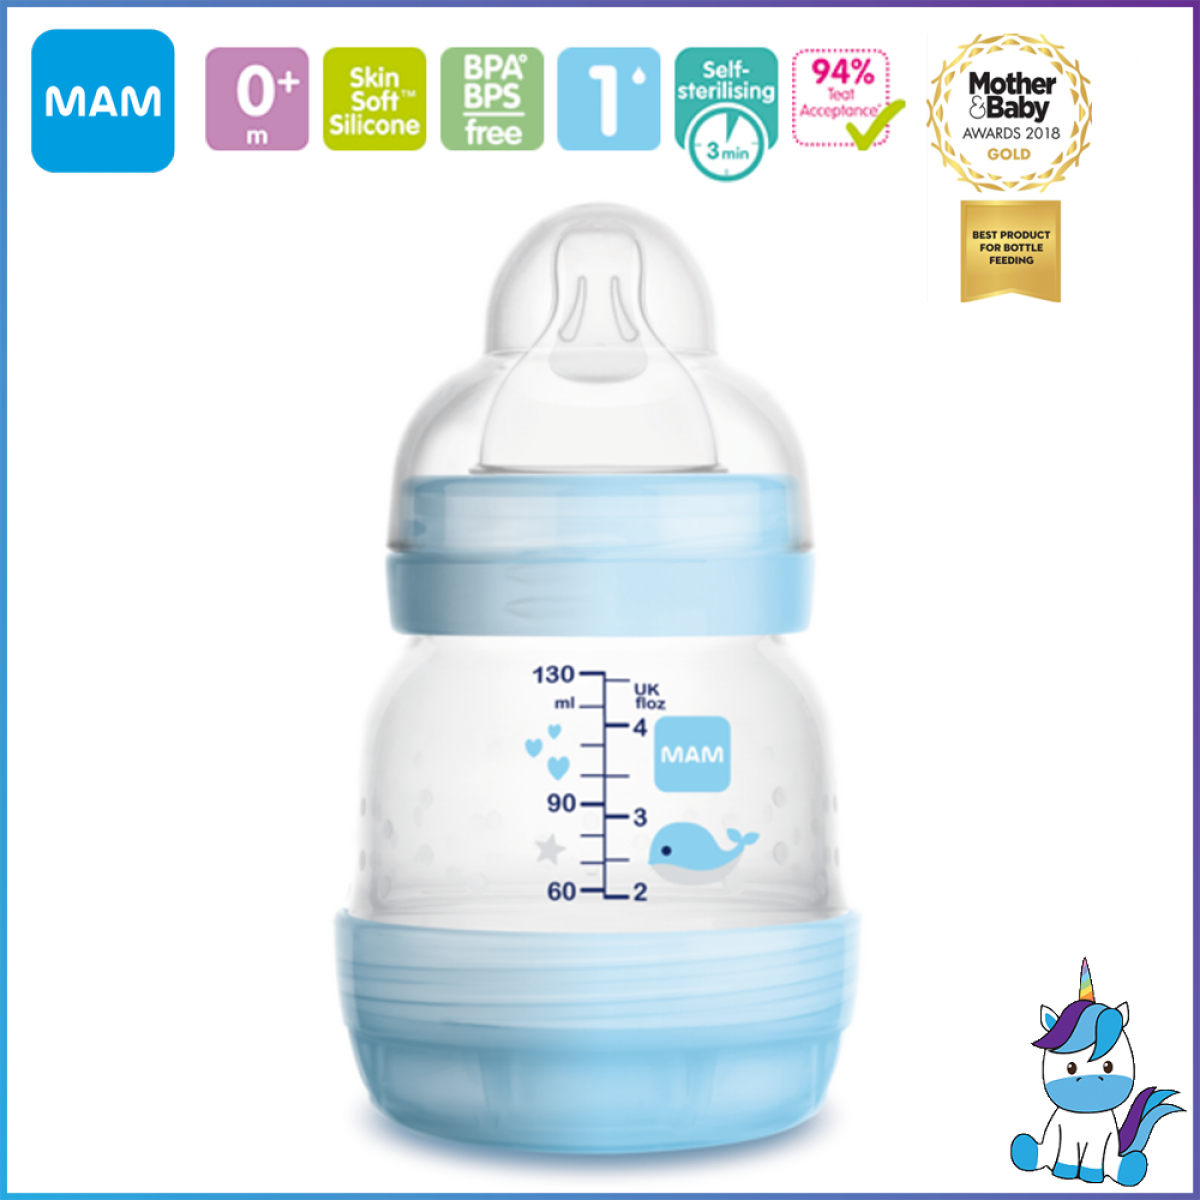 MAM Easy Start Anti-Colic Bottle with Teat 0 - (Single) 130ml